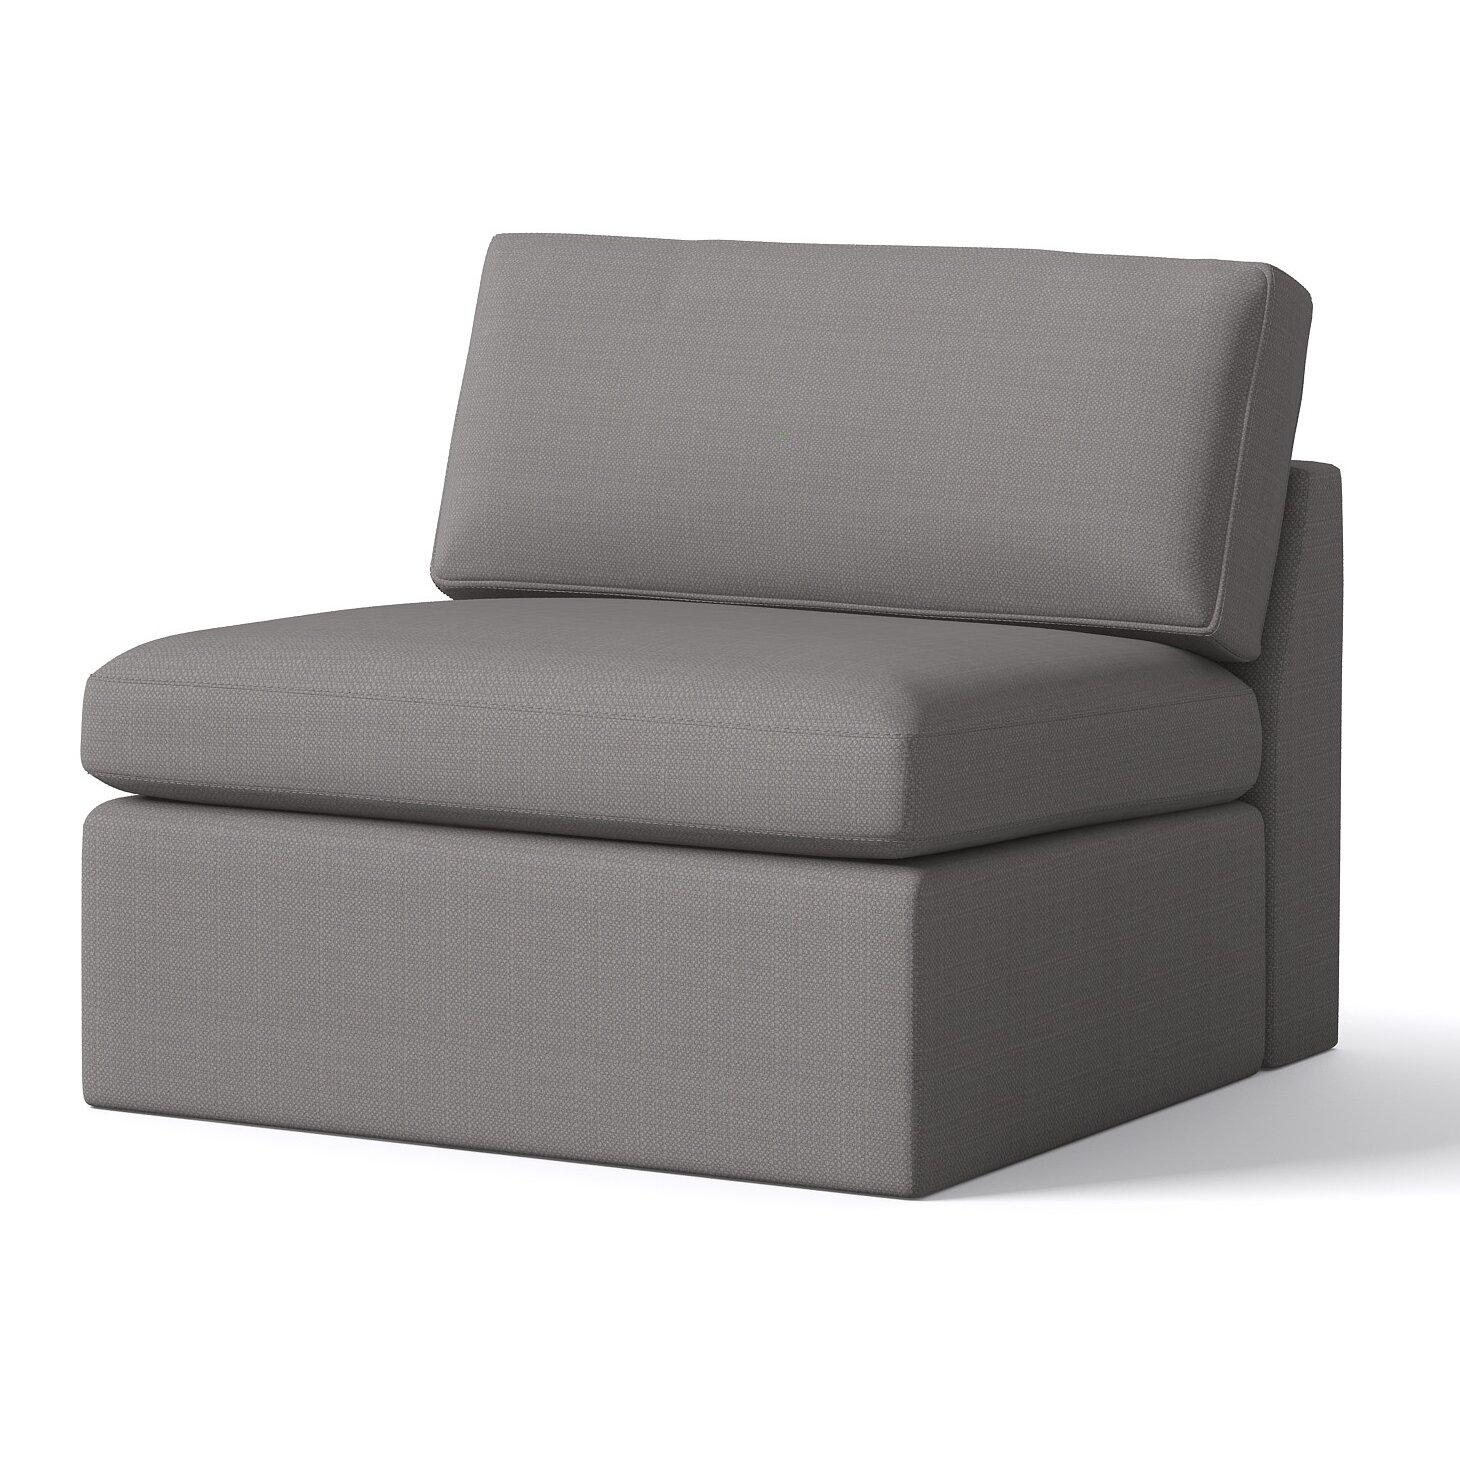 Truemodern marfa side chair wayfair